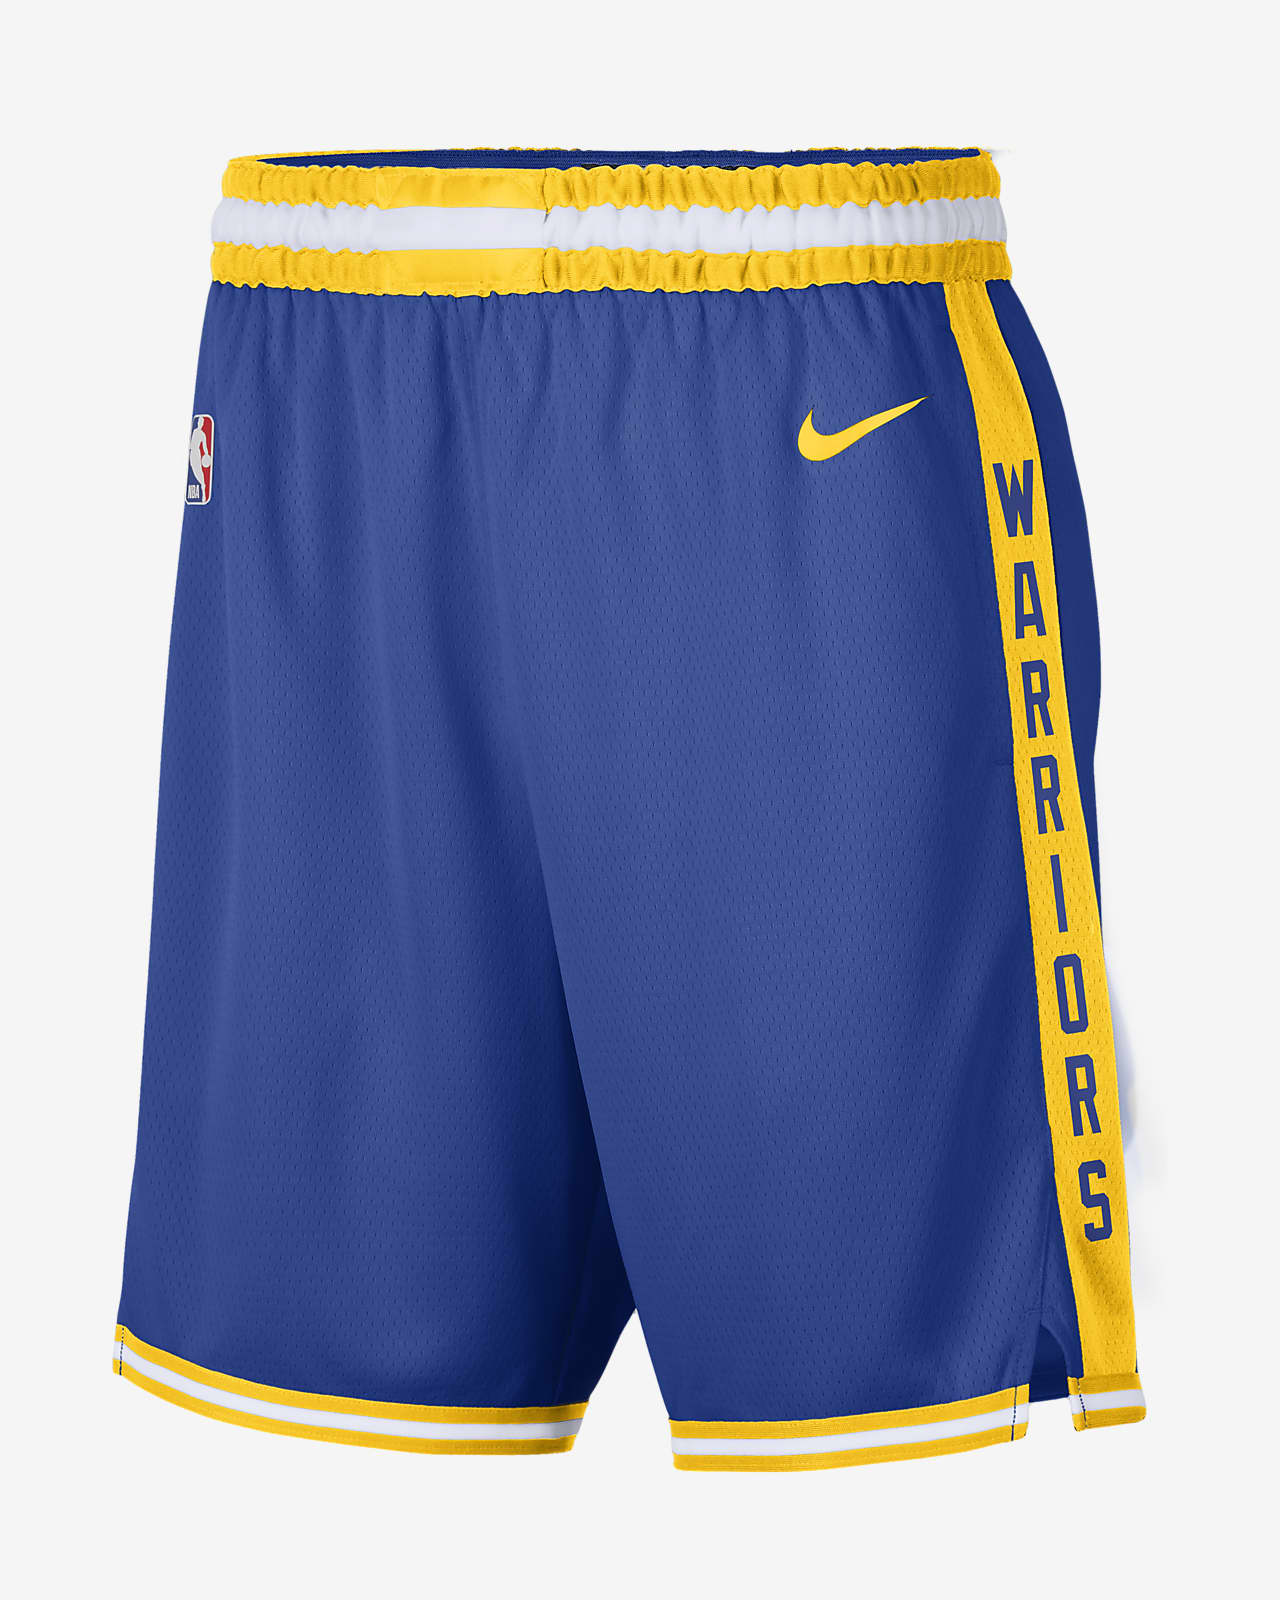 Shorts Golden State Warriors Classic Edition 2020 Swingman Nike NBA - Uomo